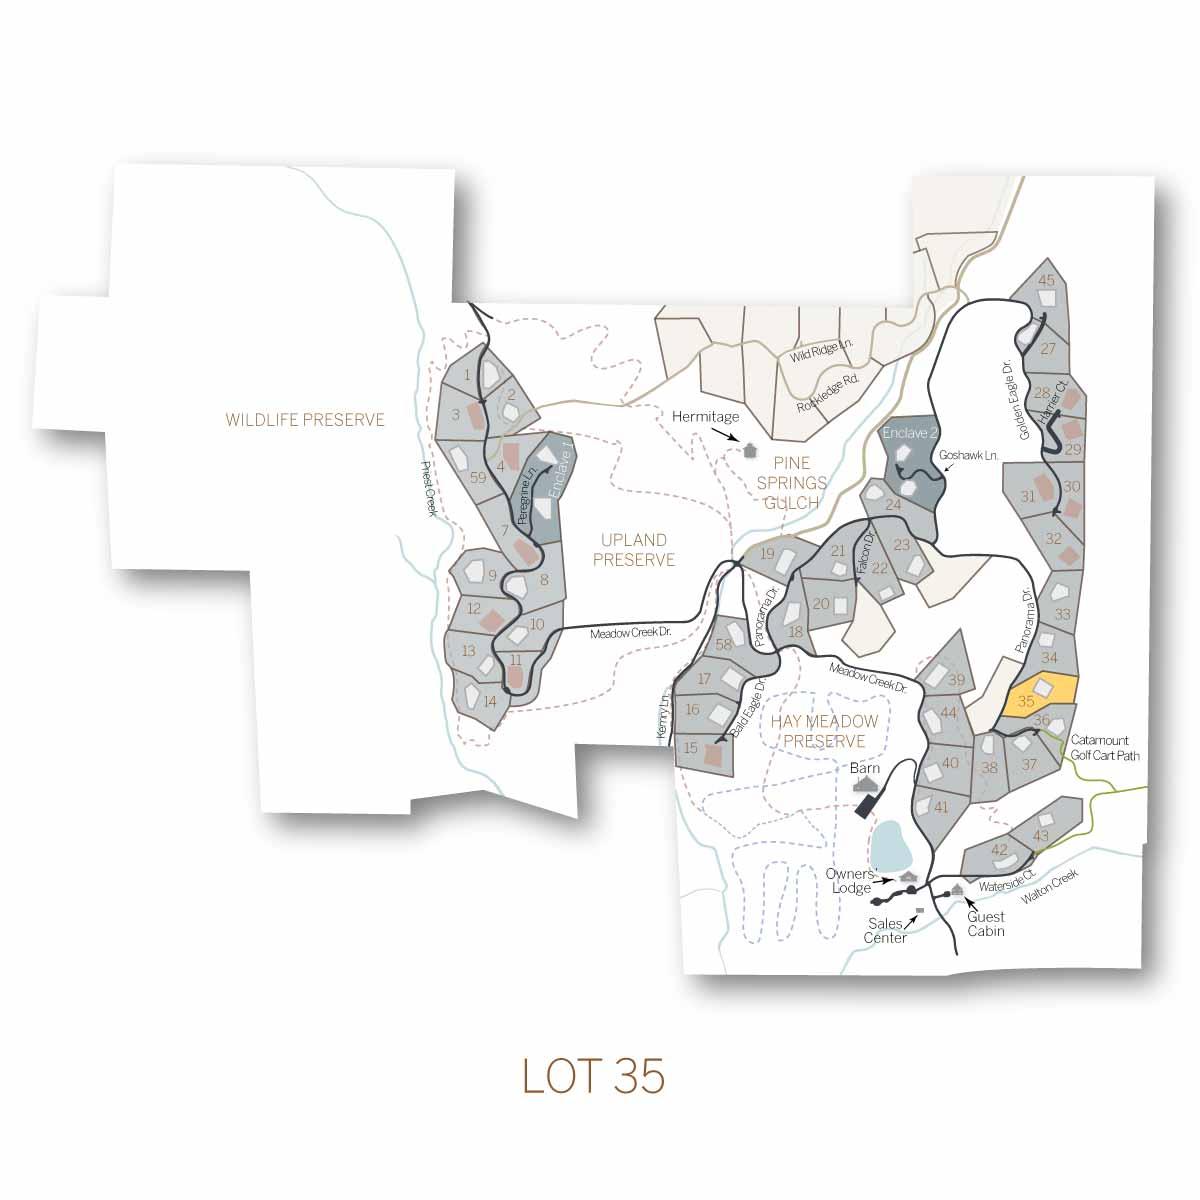 lot 35 1 - Homesite #35